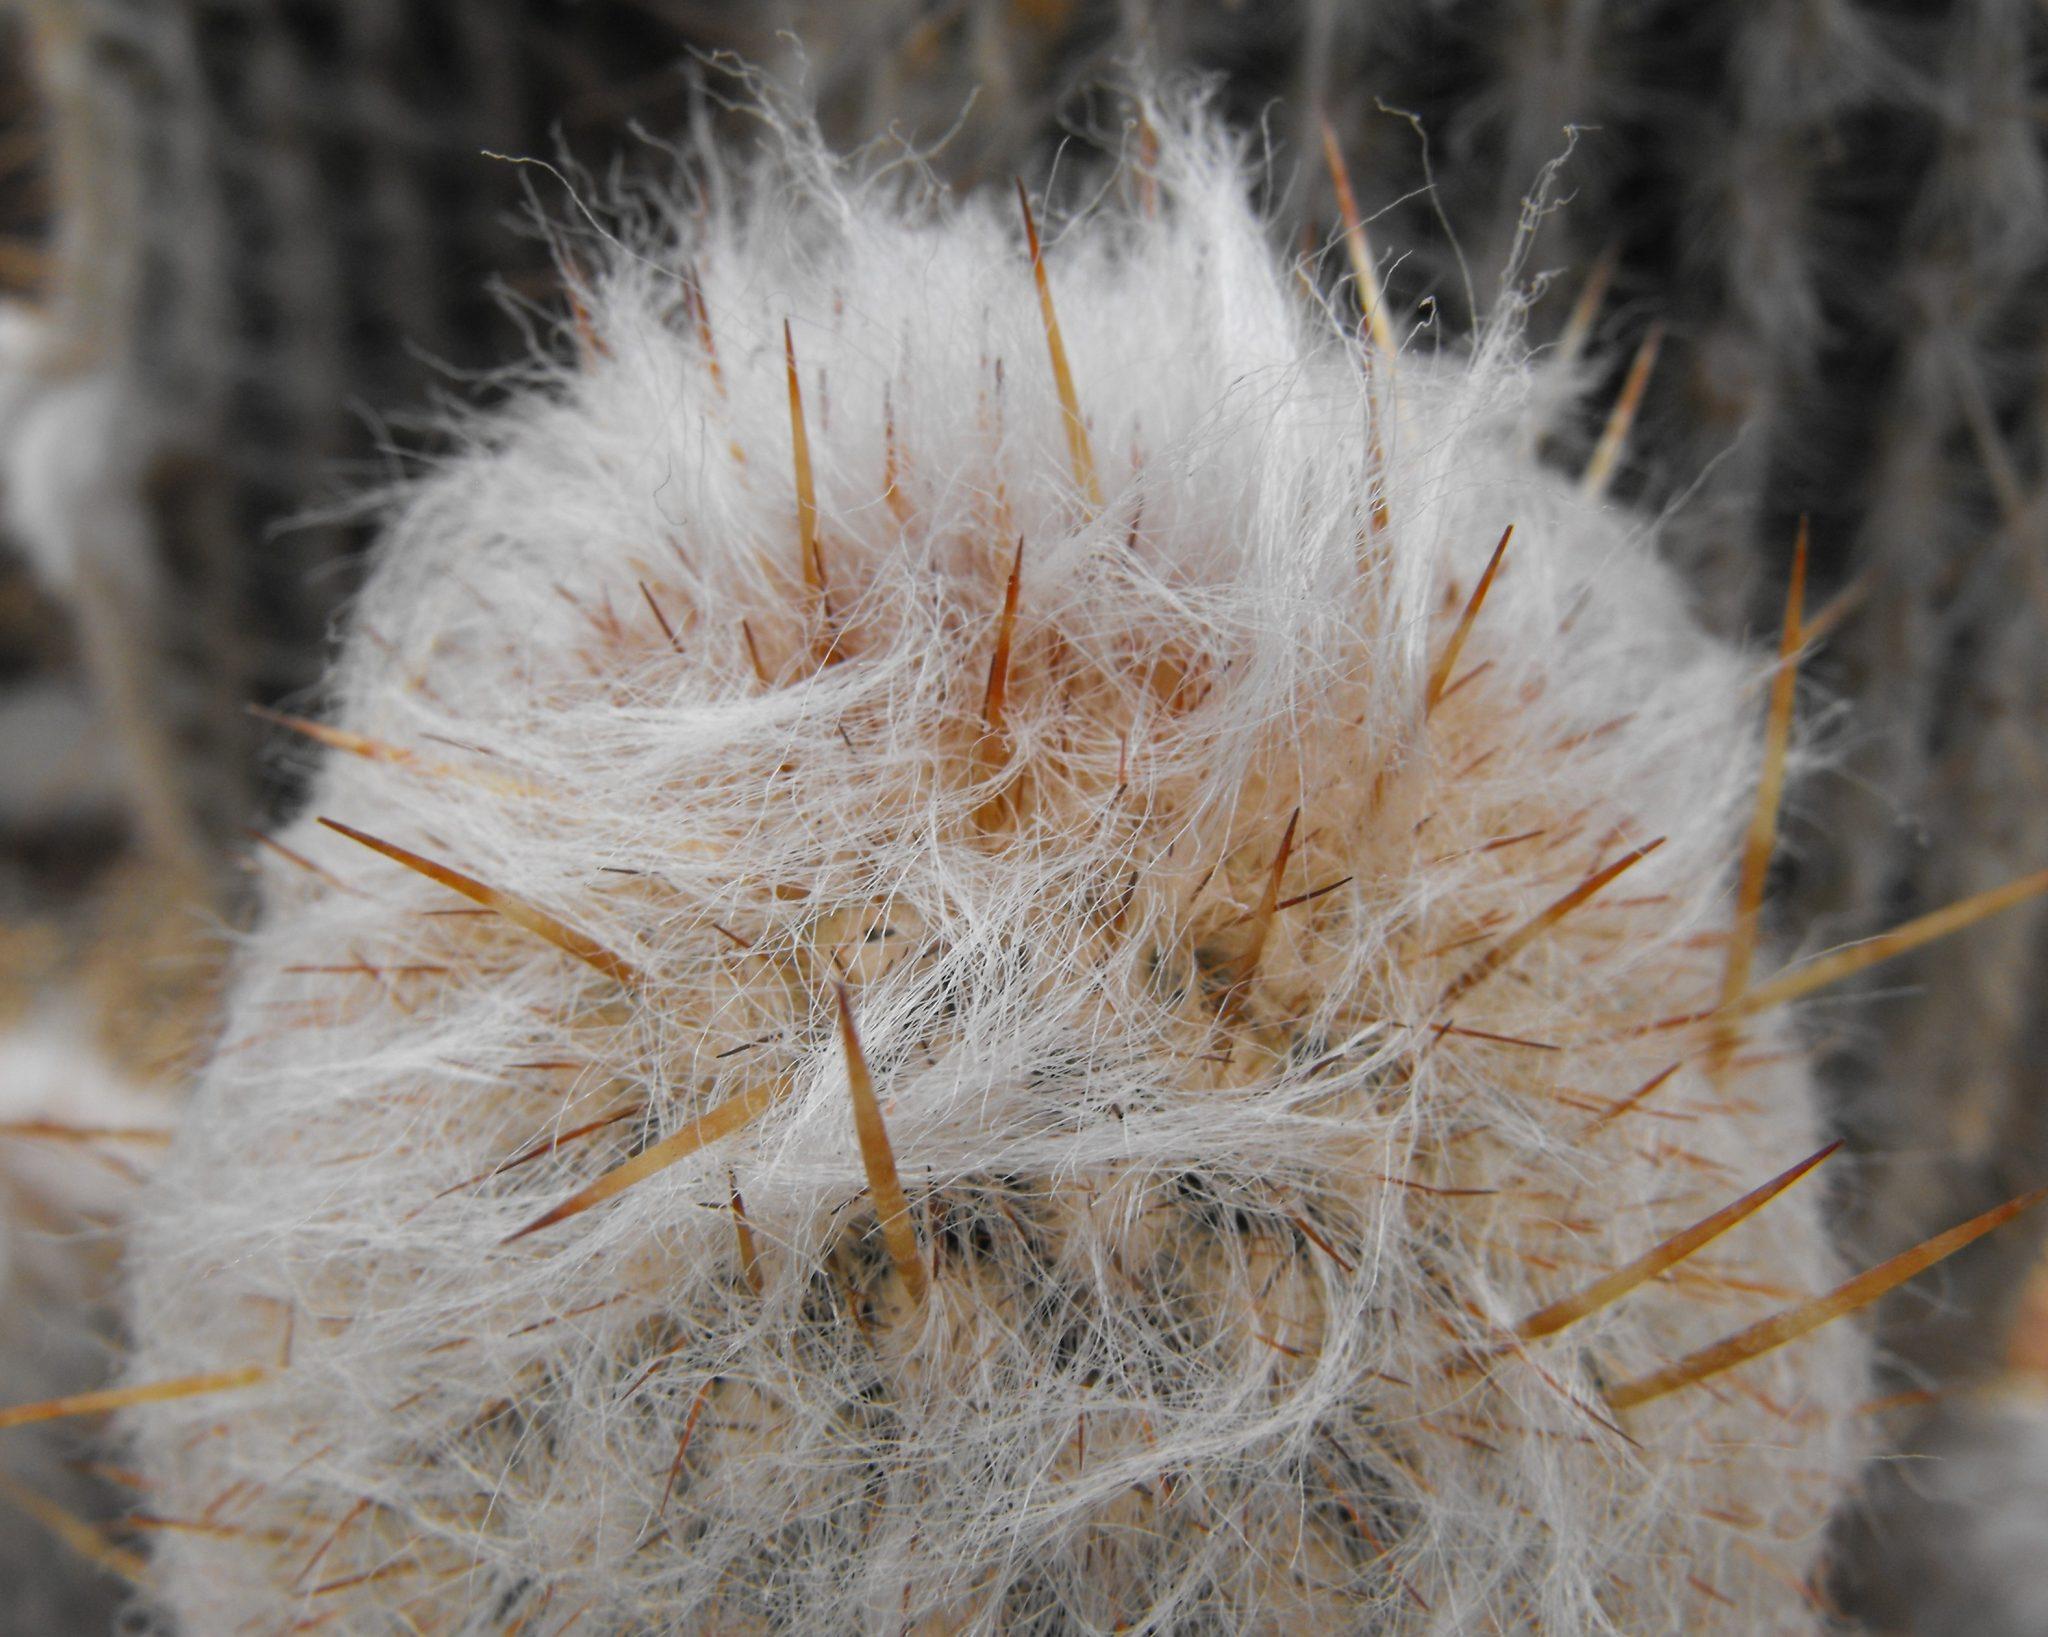 Las espinas de la Espostoa lanata son agudas